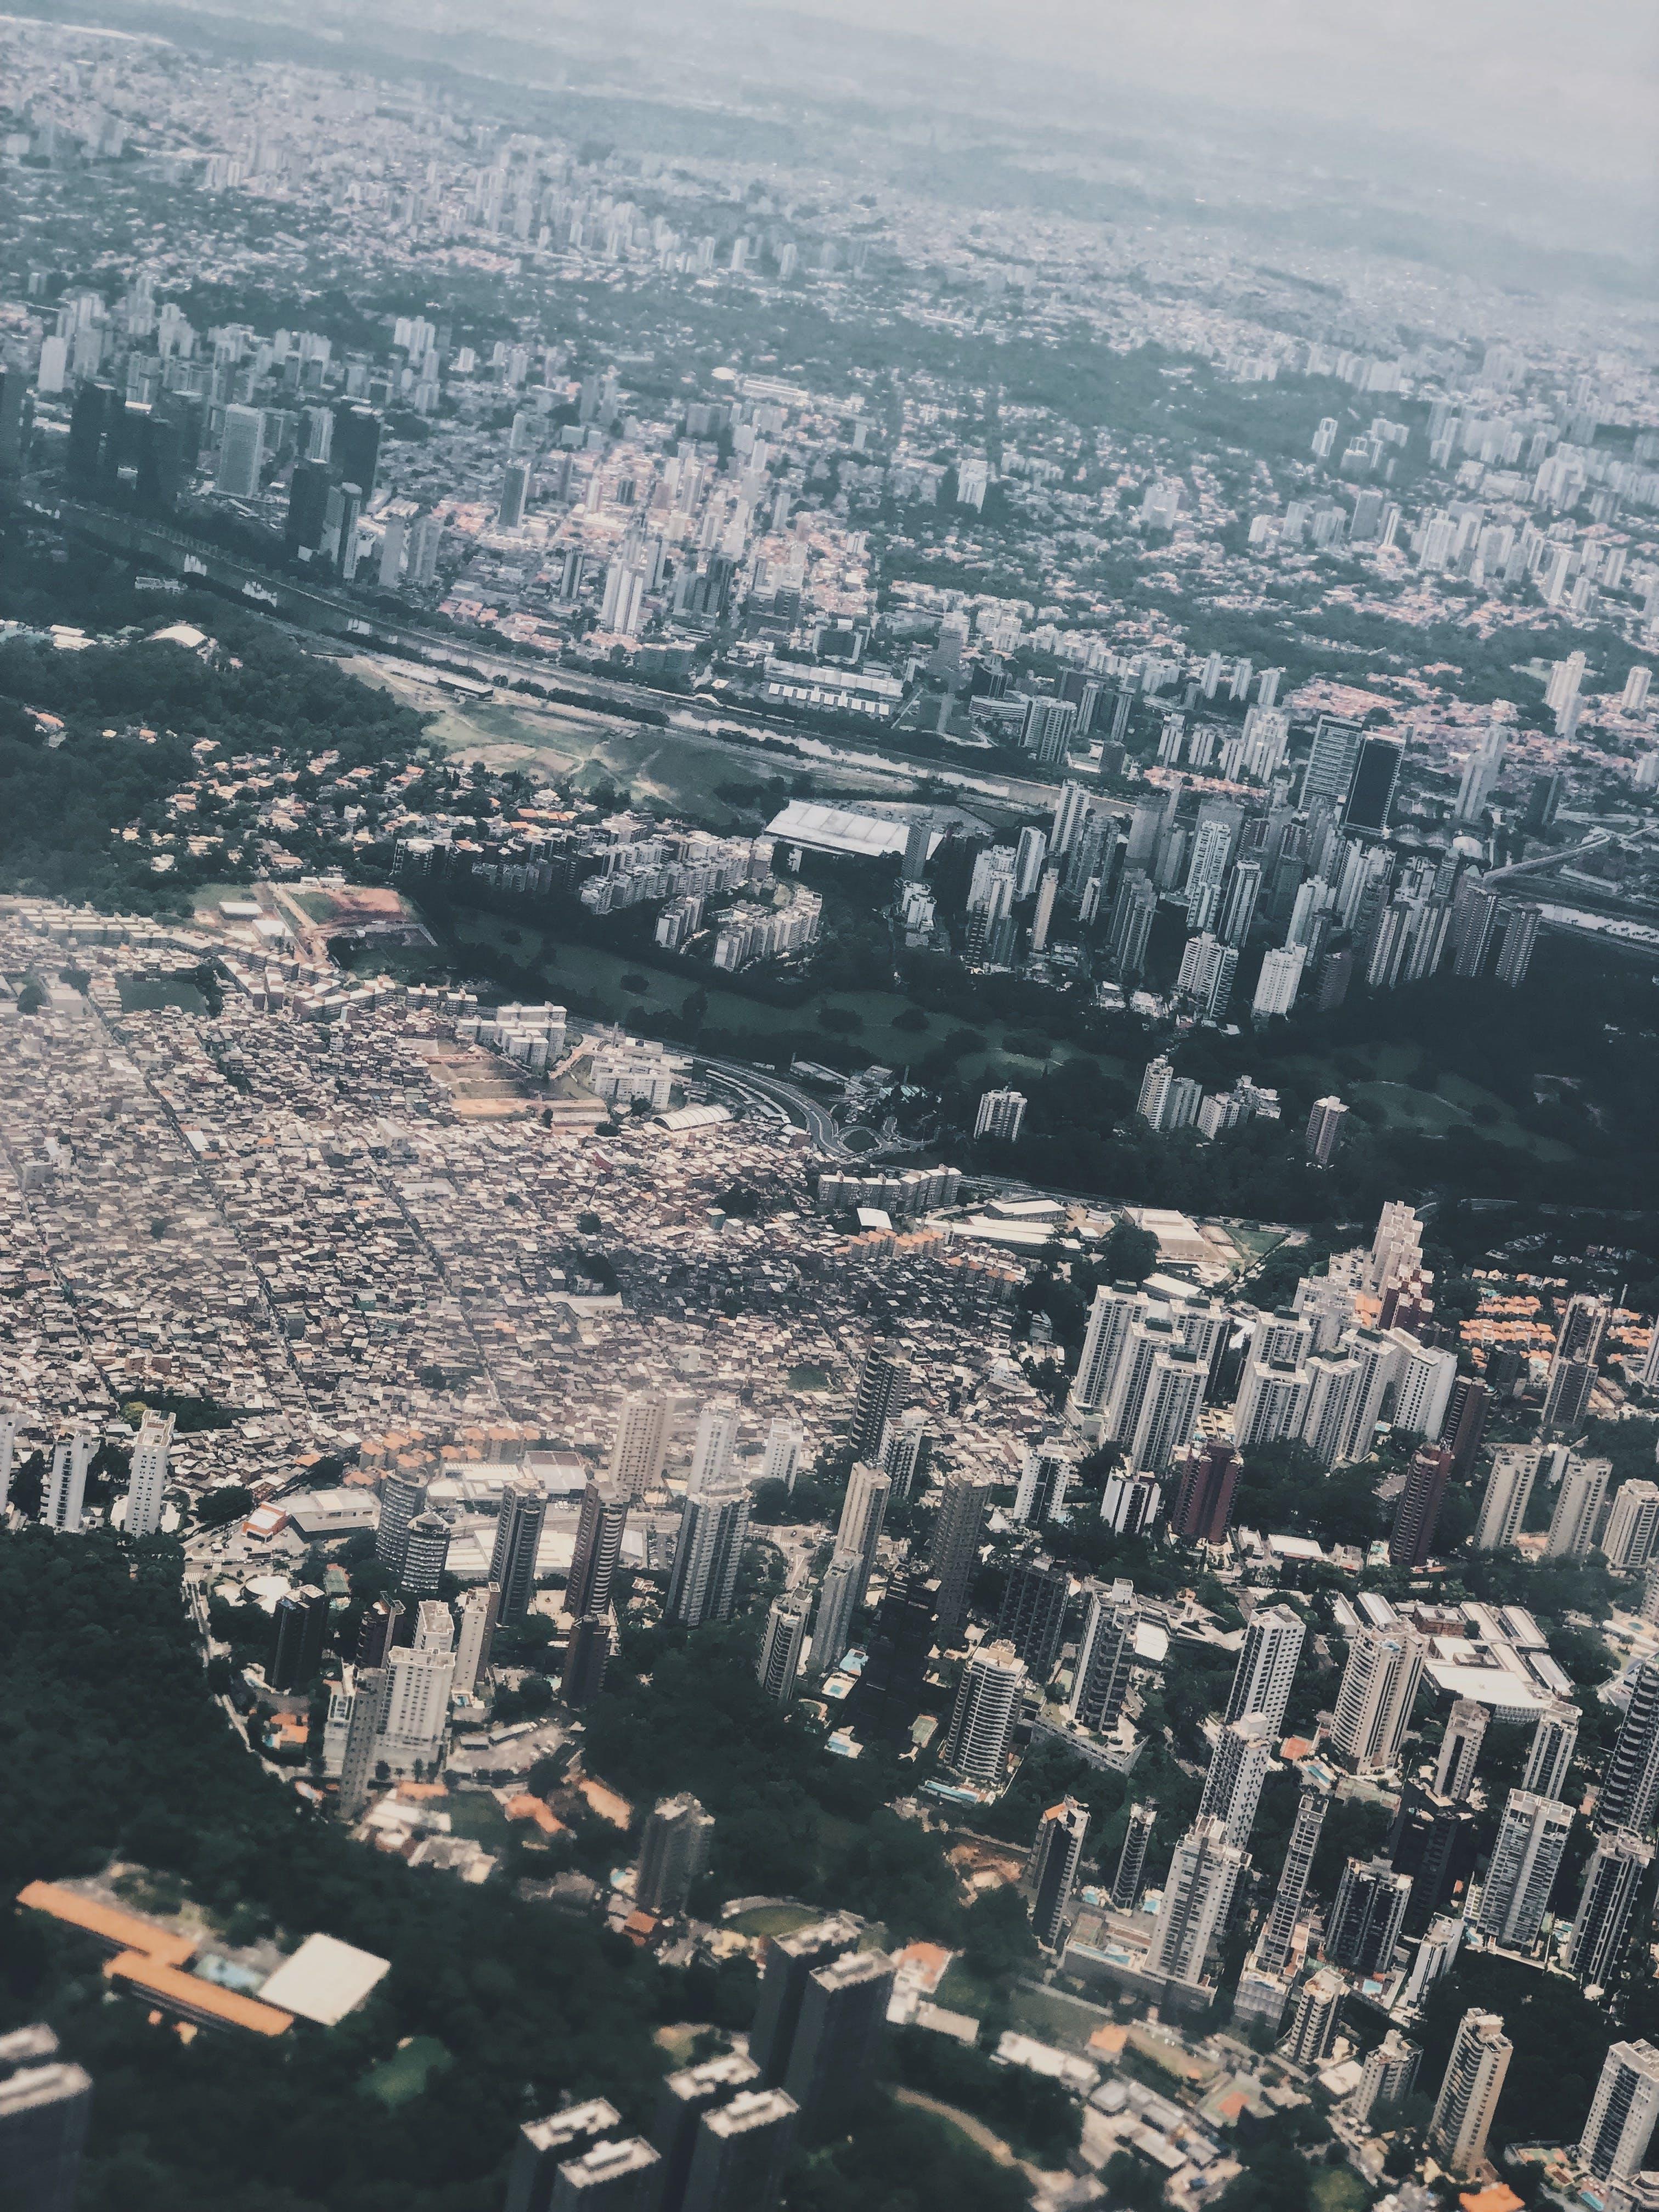 Bird's Eye View Of City During Daytime